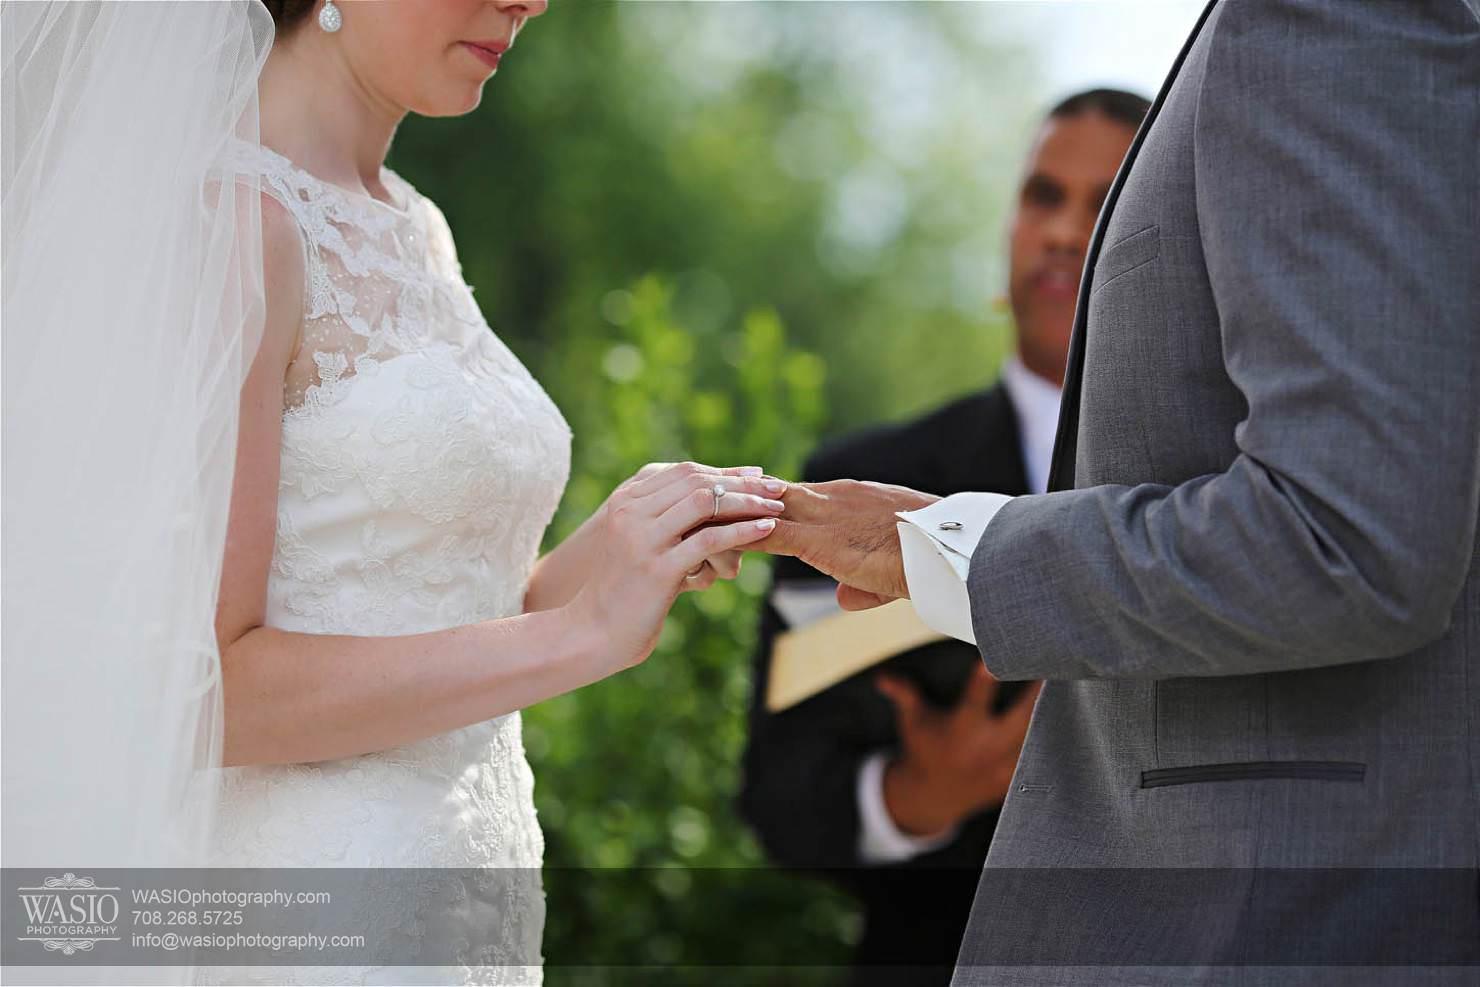 wedding-wasio-ceremonii-ring-vows Chevy Chase Country Club Wedding - Elizabeth & Michael